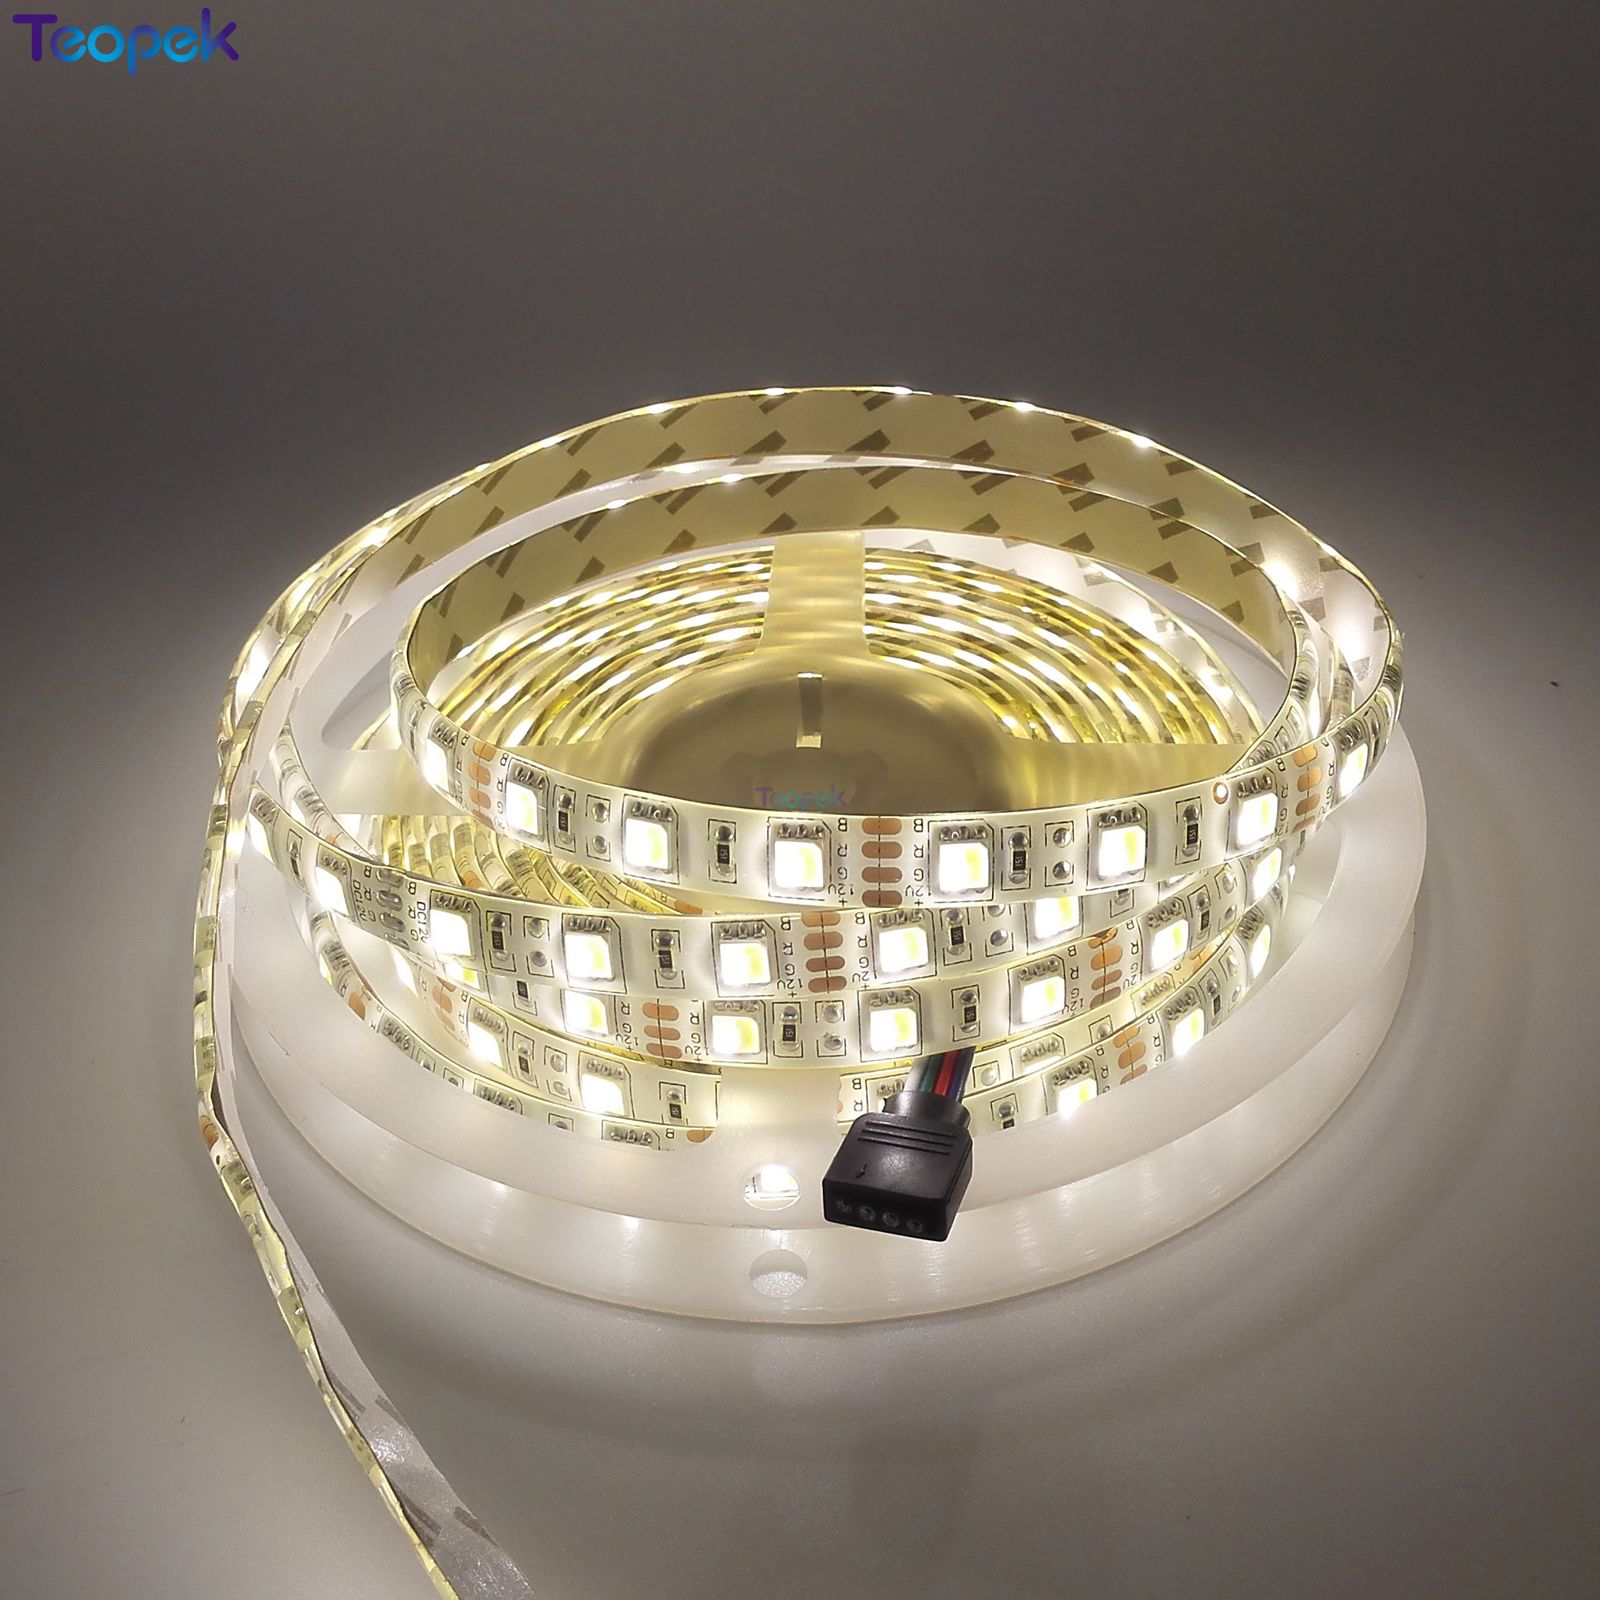 lowest price Novelty Recessed Led lamp Spot led downlight 220V 110V Colorful LED Bulb Spot Light For Living Room KTV Party Decoration Lamp